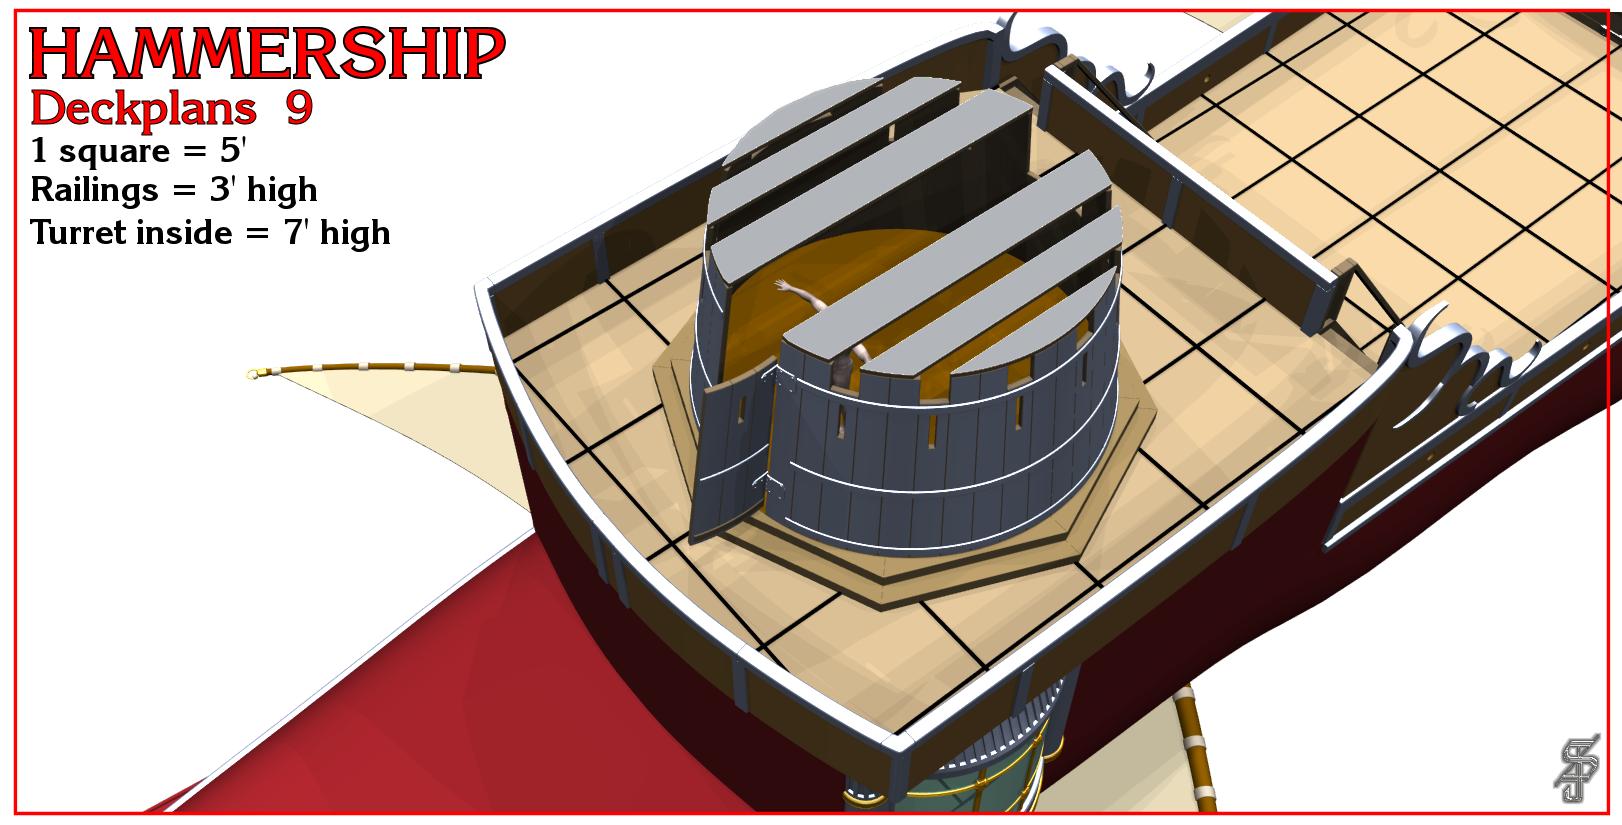 Hammership layout 9